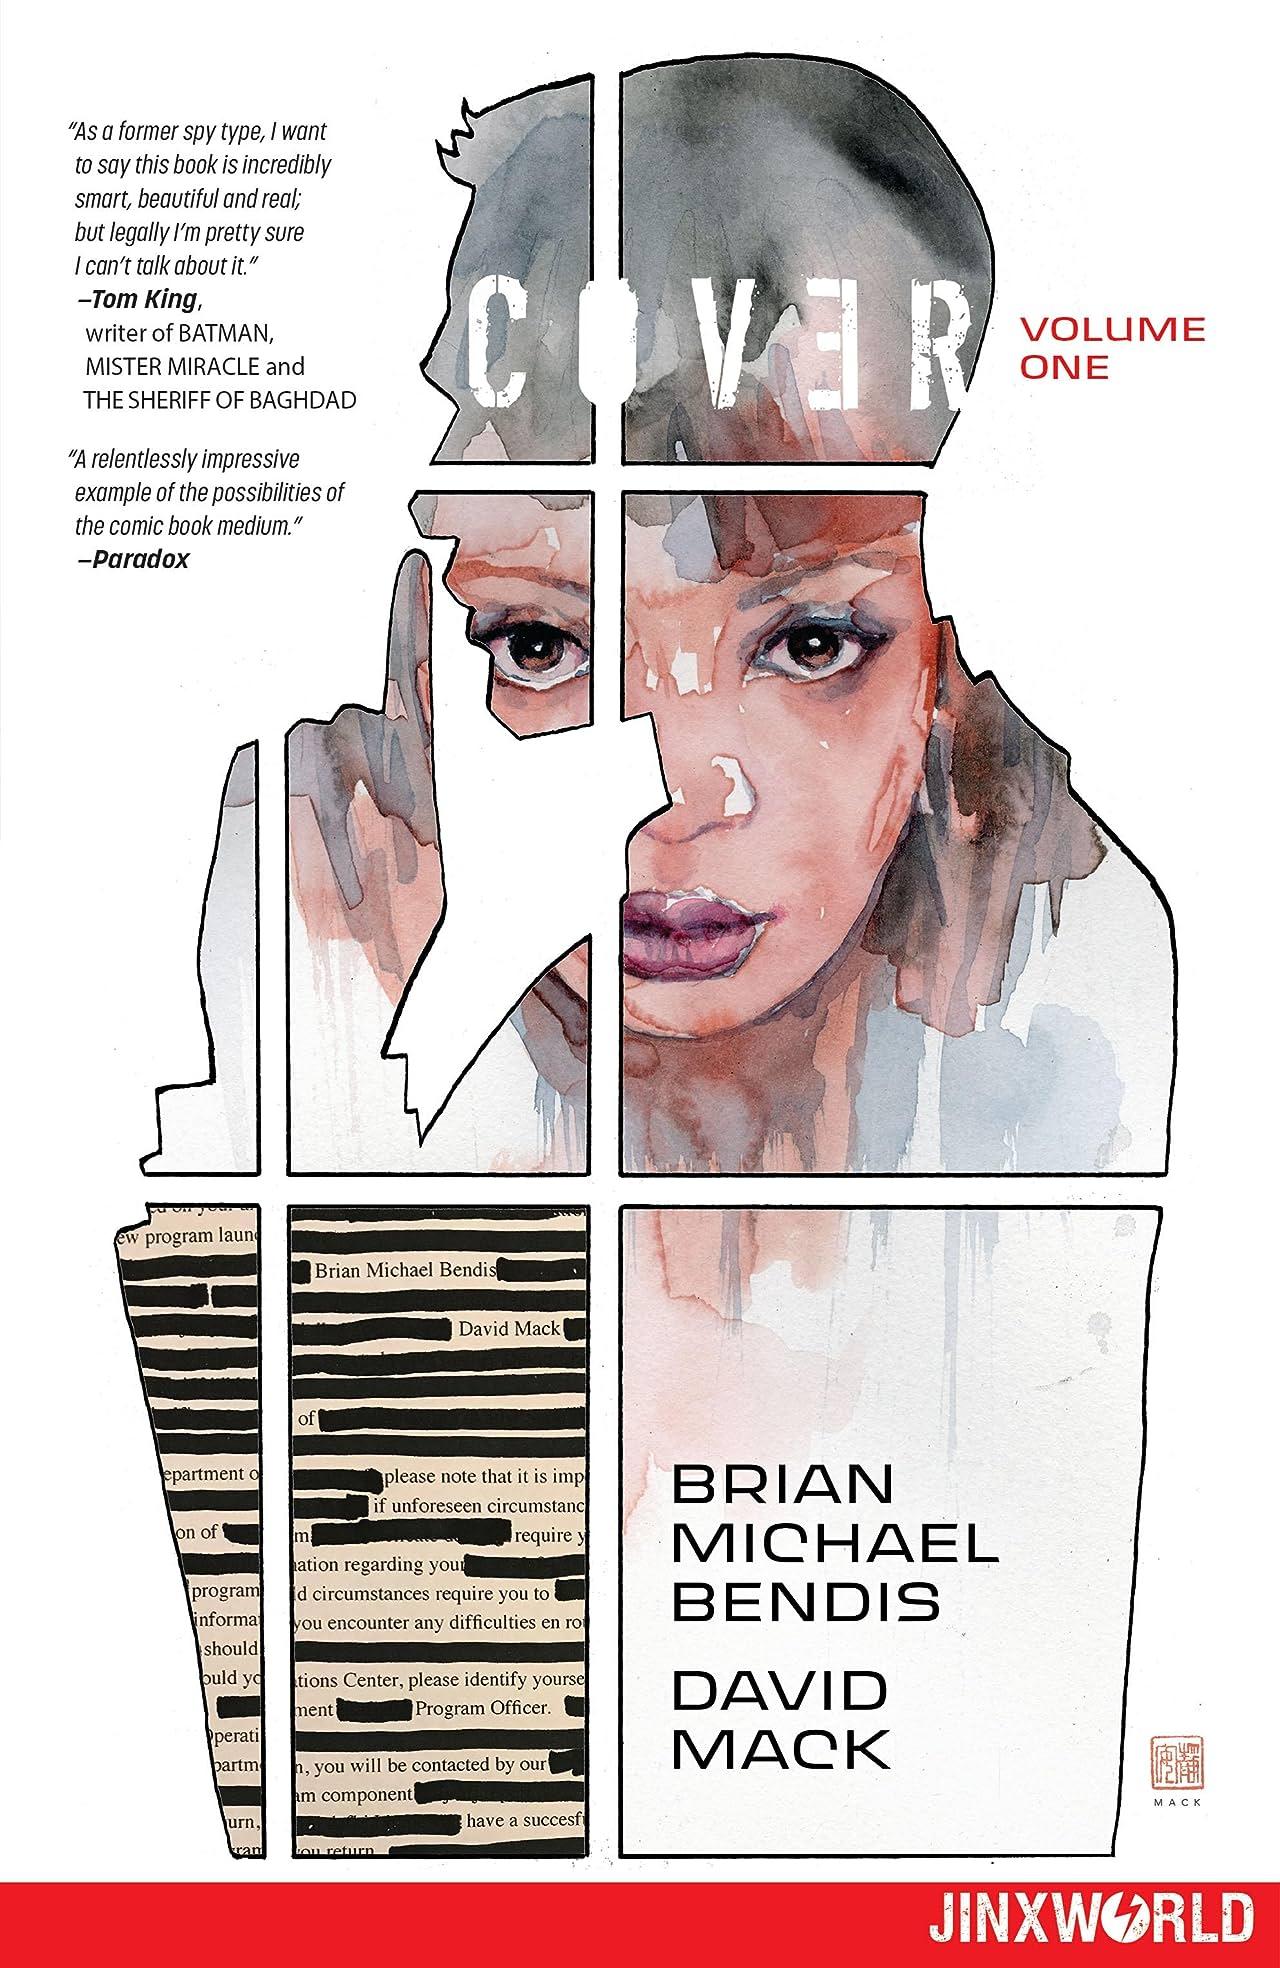 Cover Vol. 1